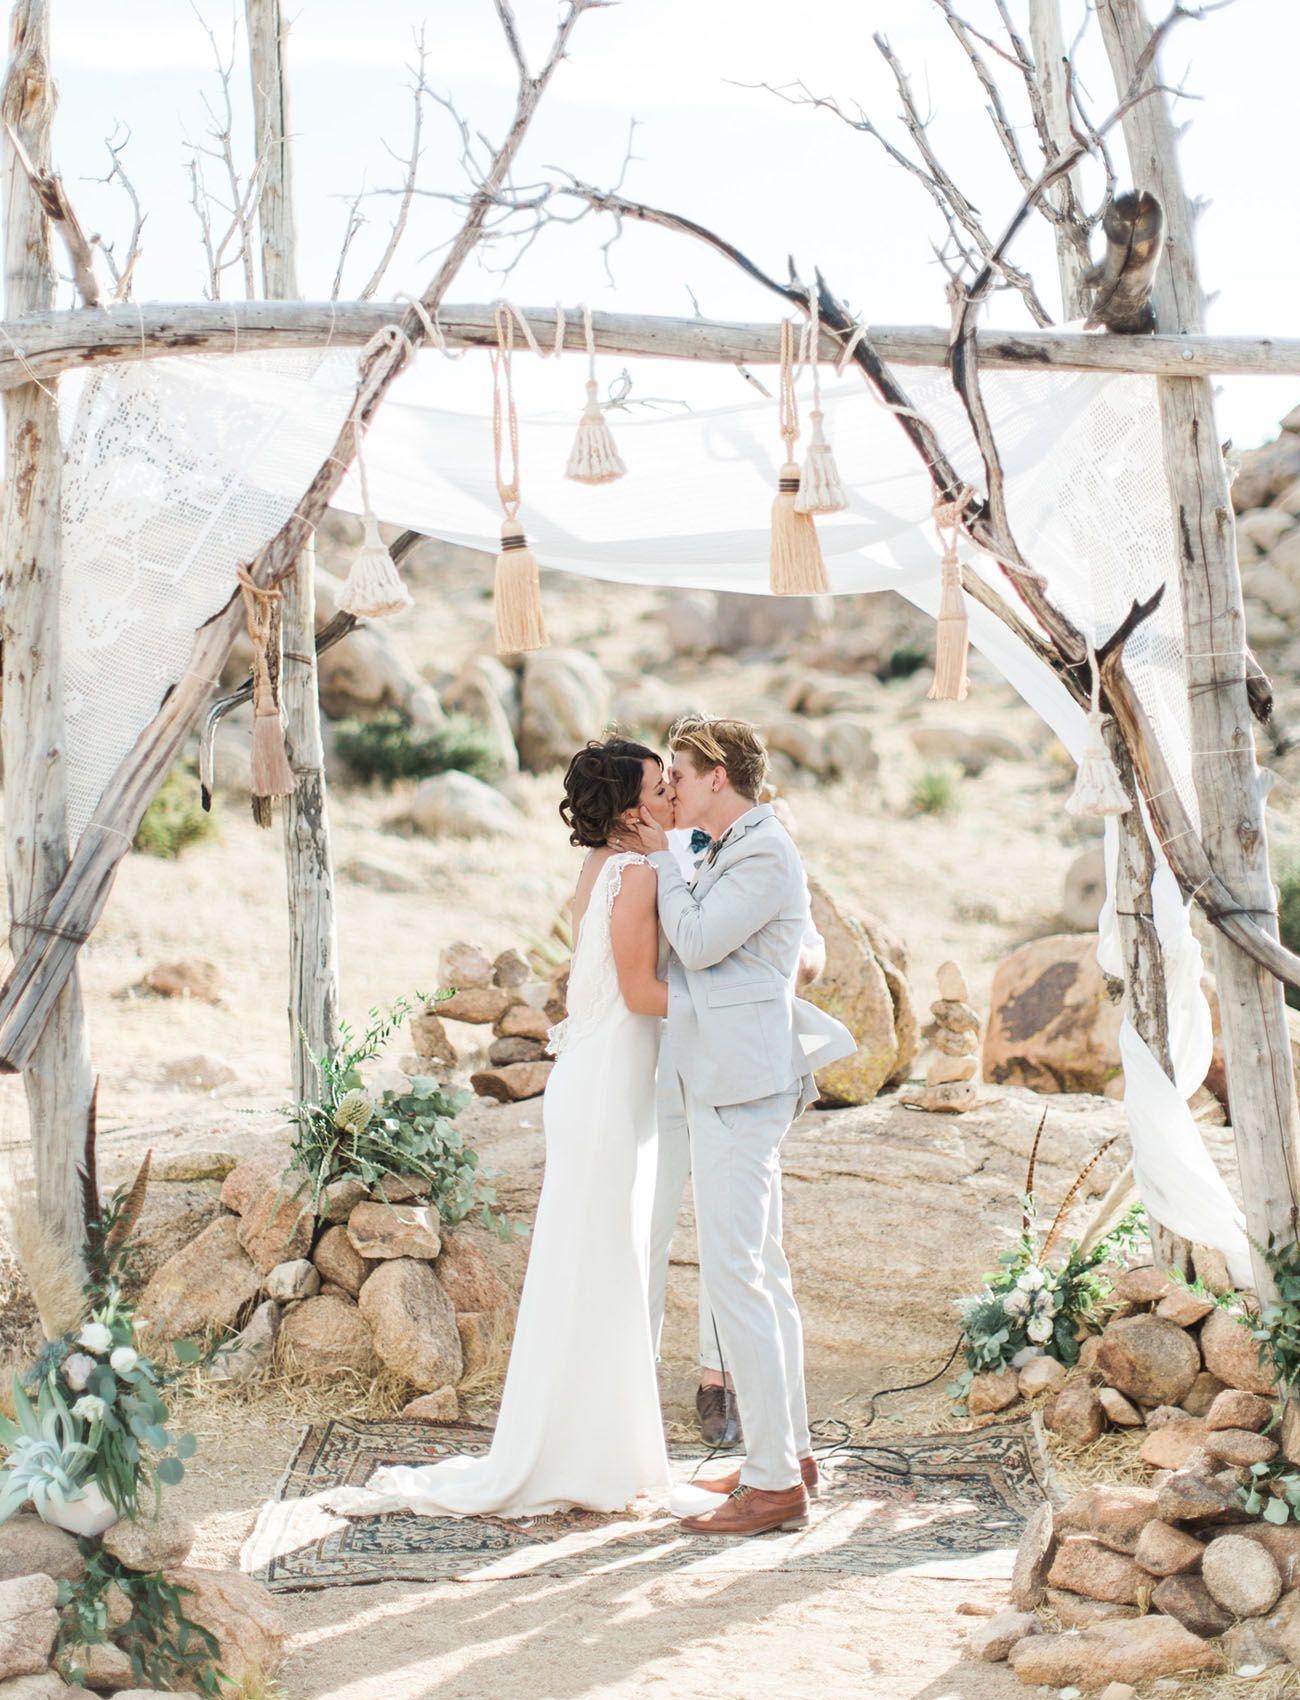 Eclectic Moroccan Joshua Tree Glamping Wedding